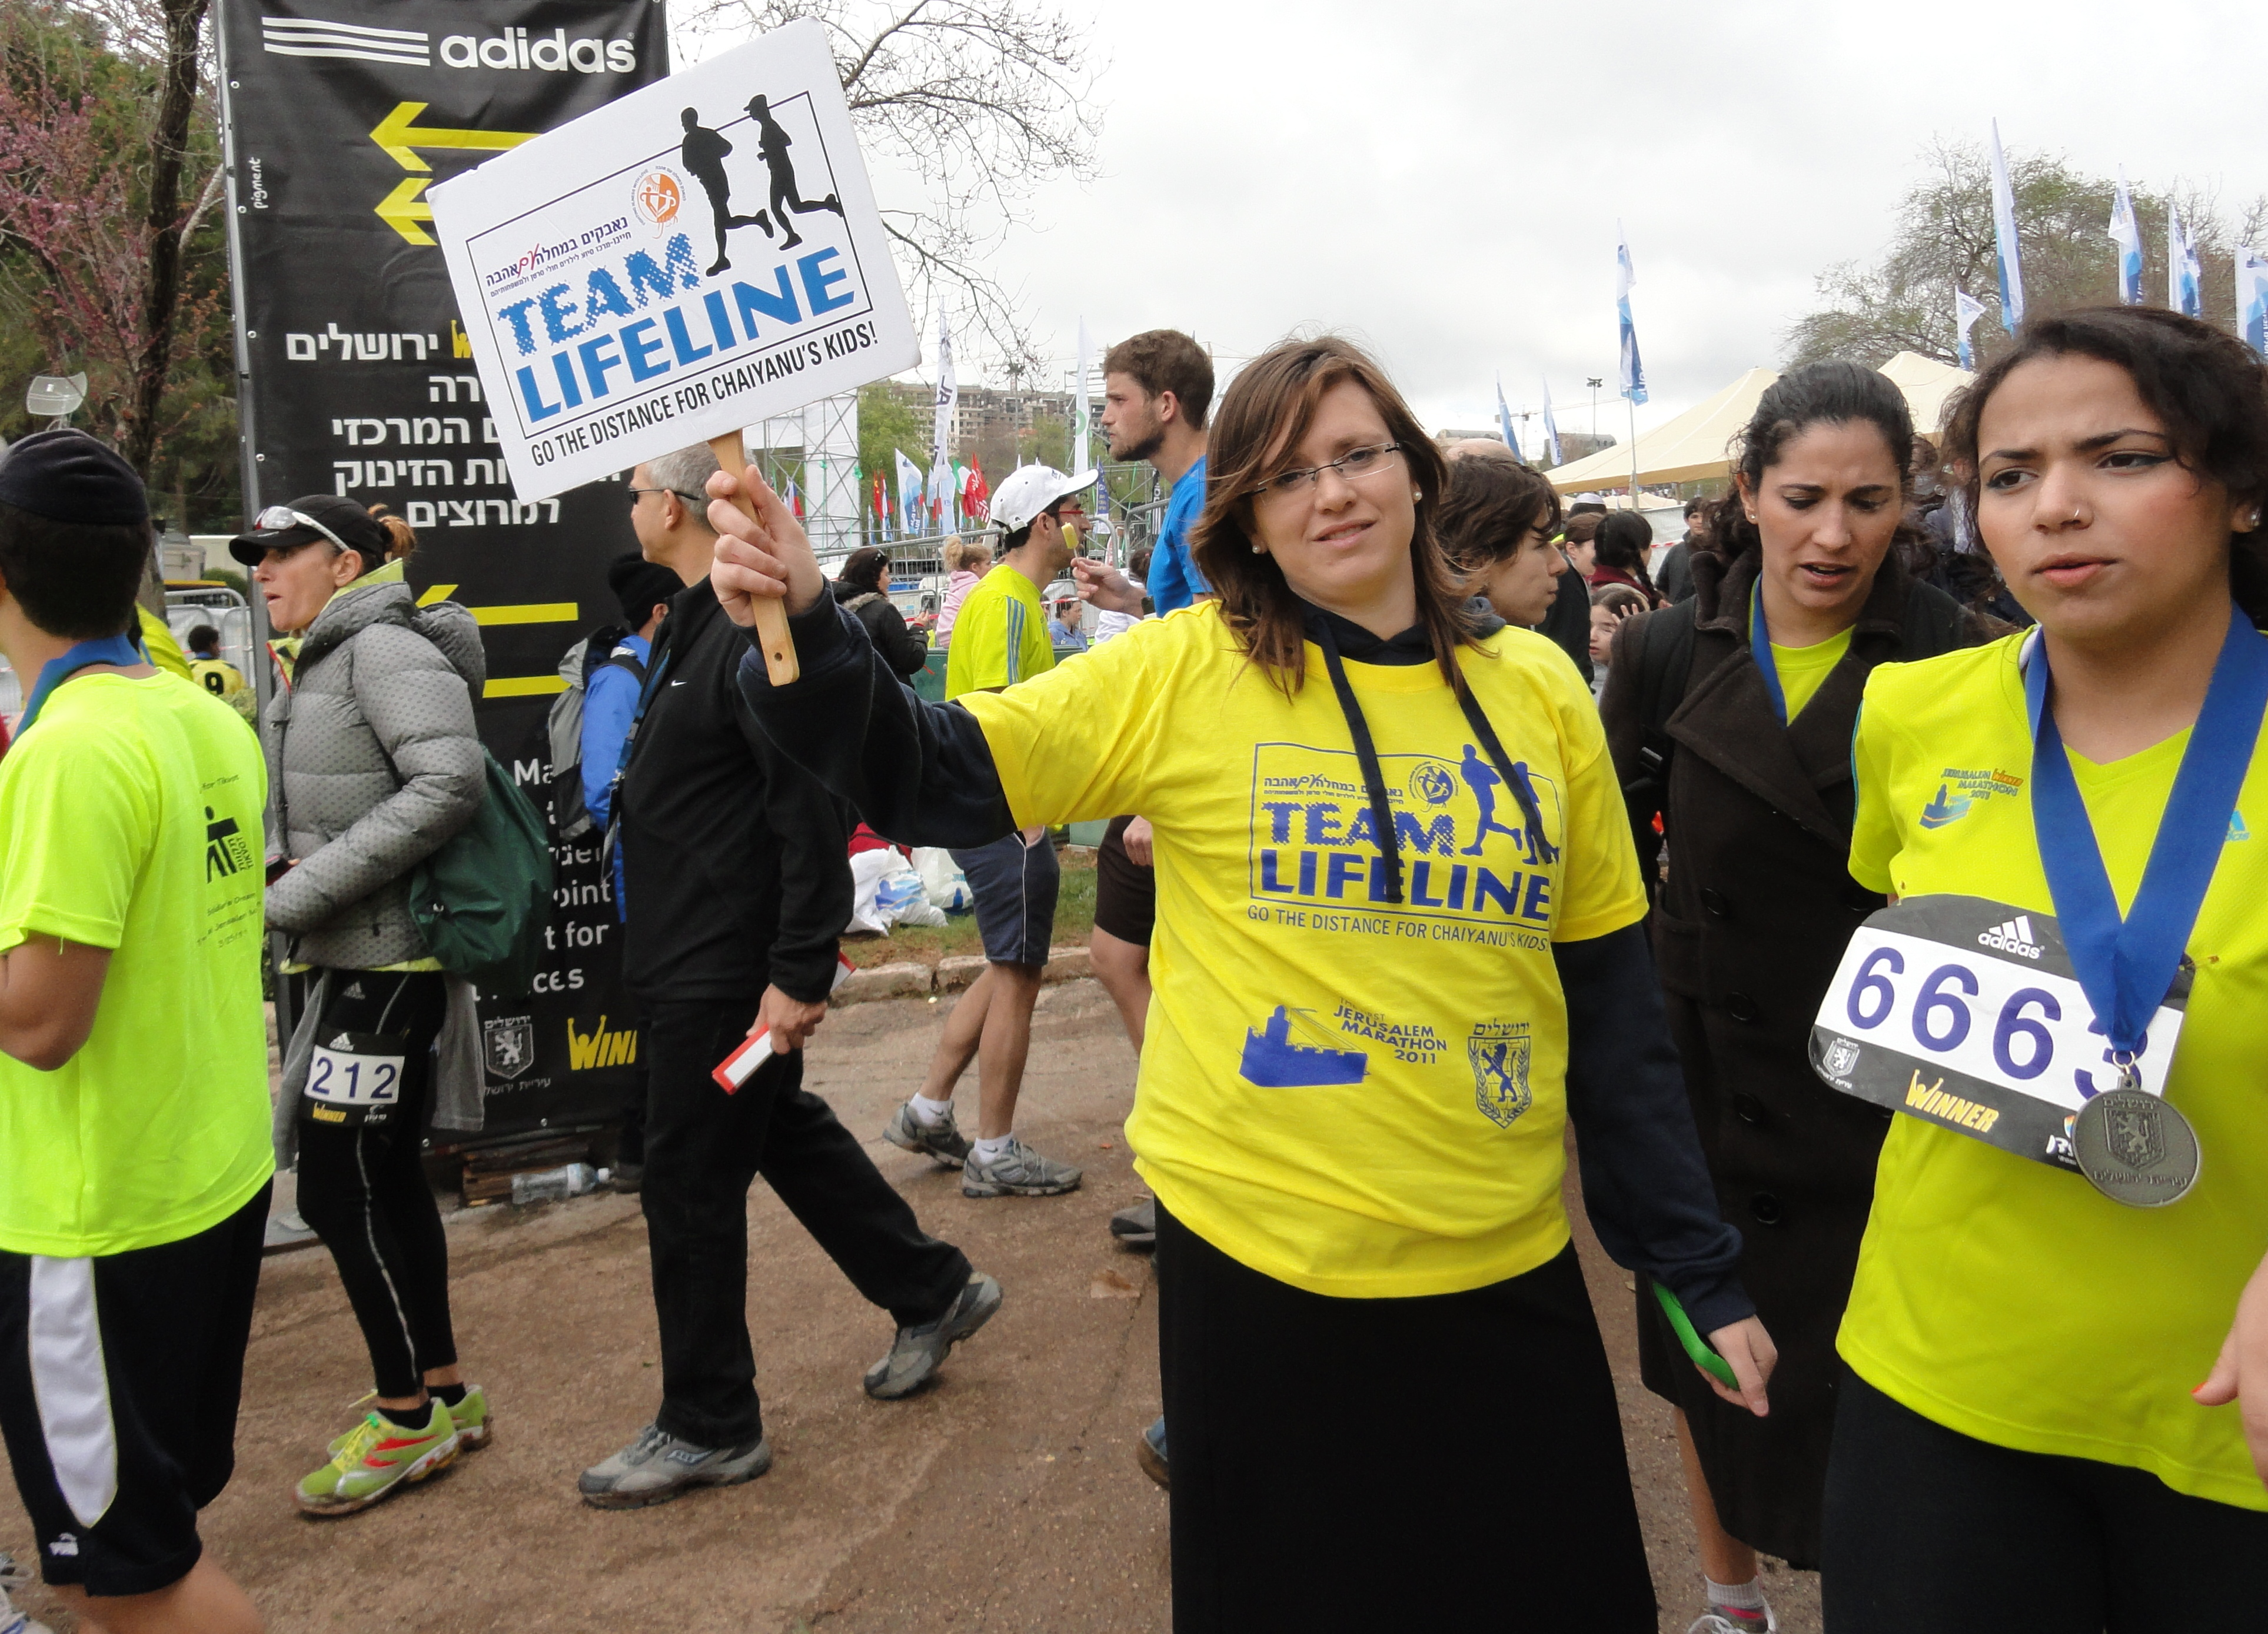 Chai Life line image, Chai Lifeline runners image